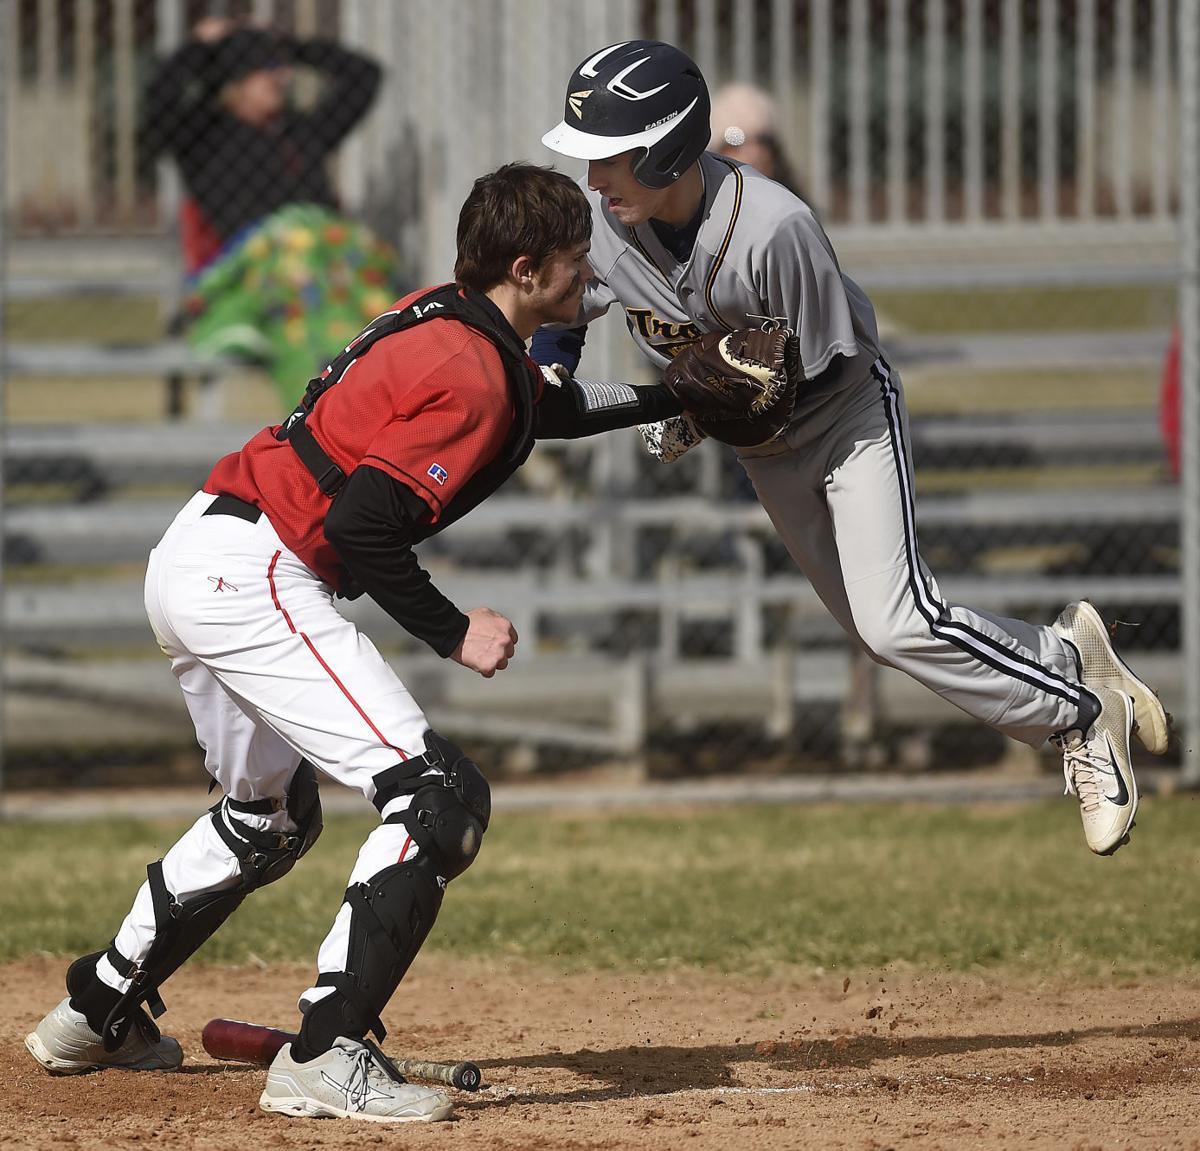 Baseball - Wendell Vs. Kimberly